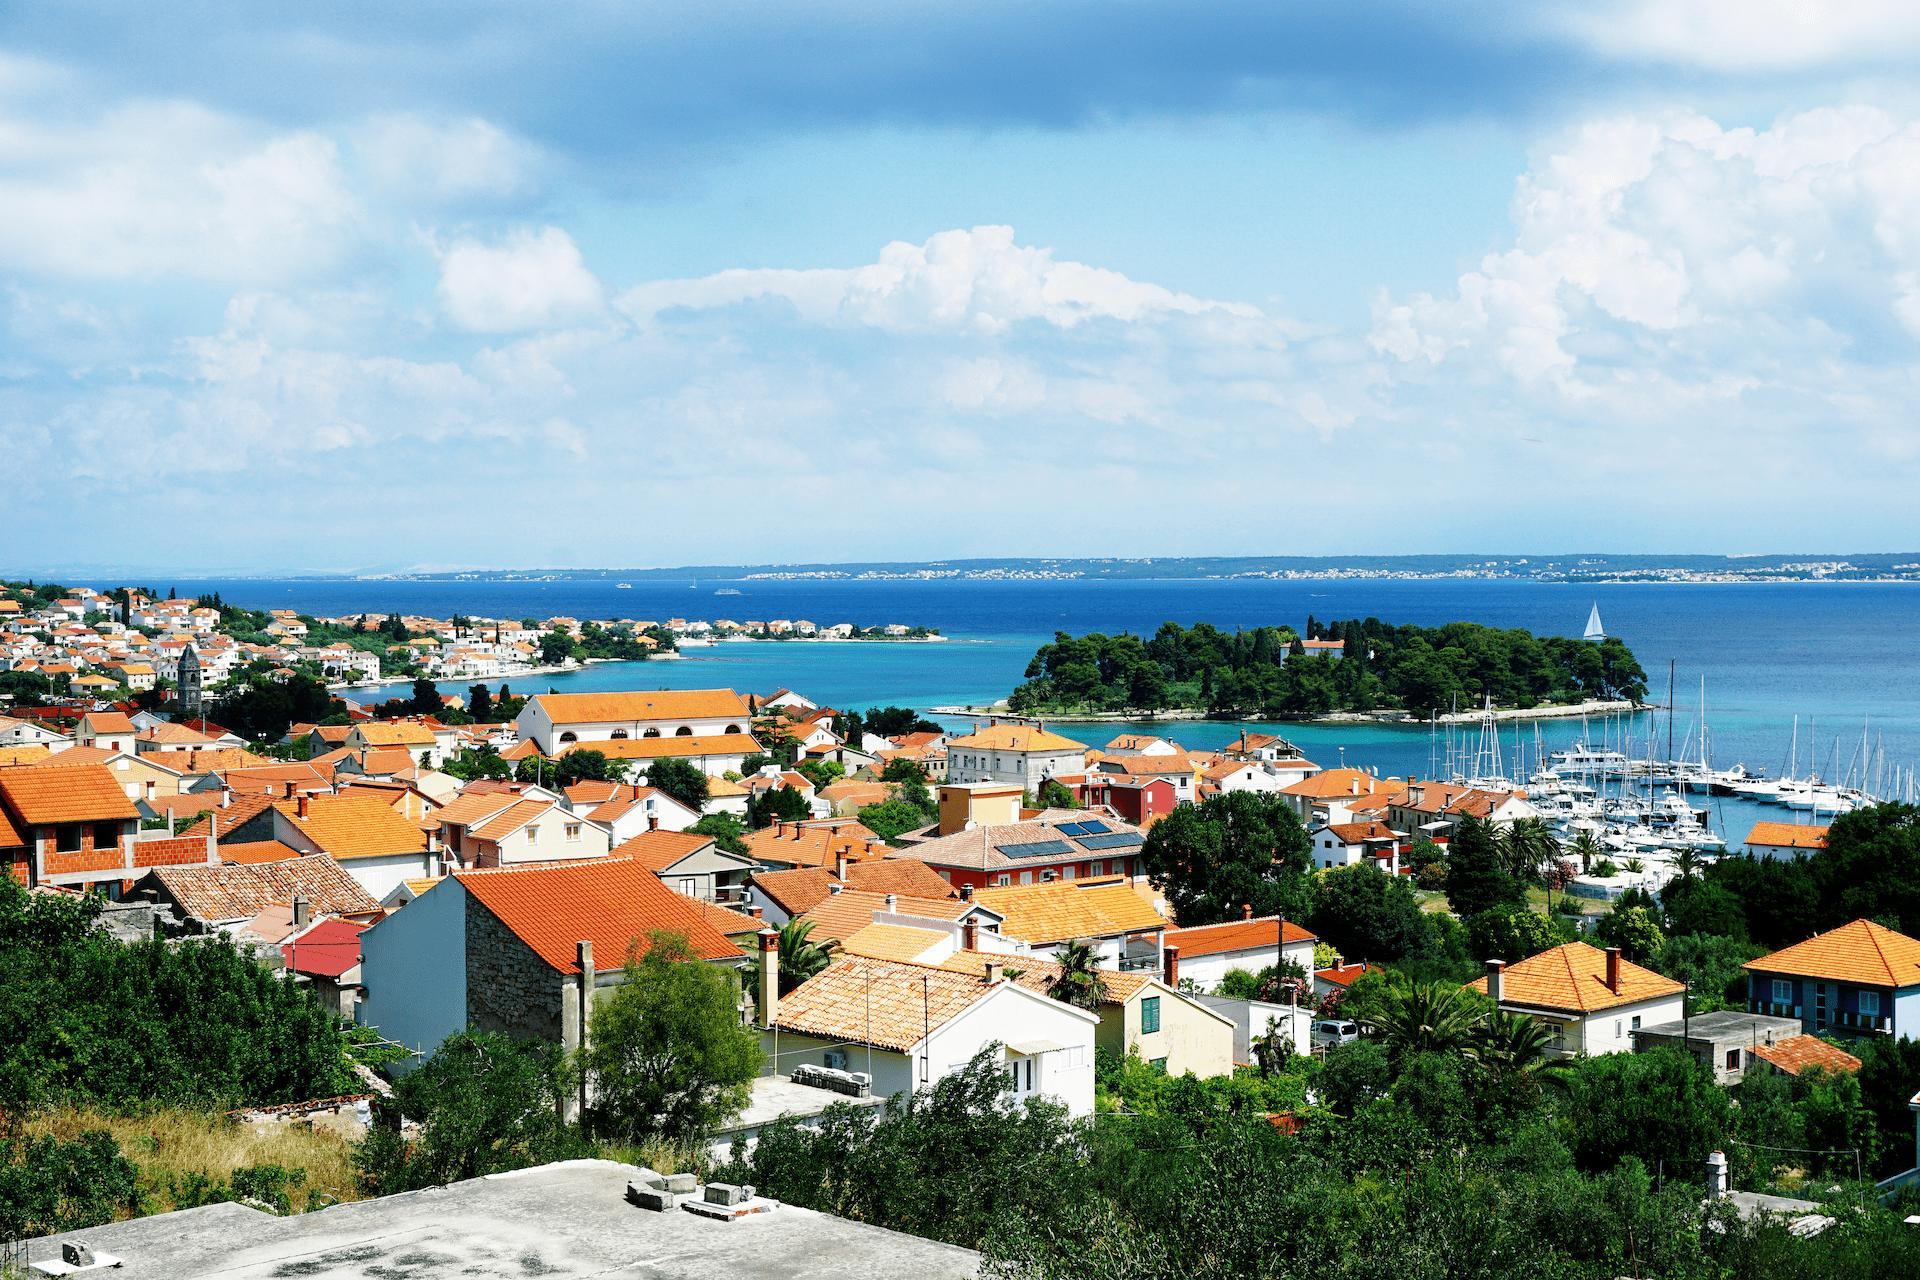 View on village Preko, island Ugljan, Croatia